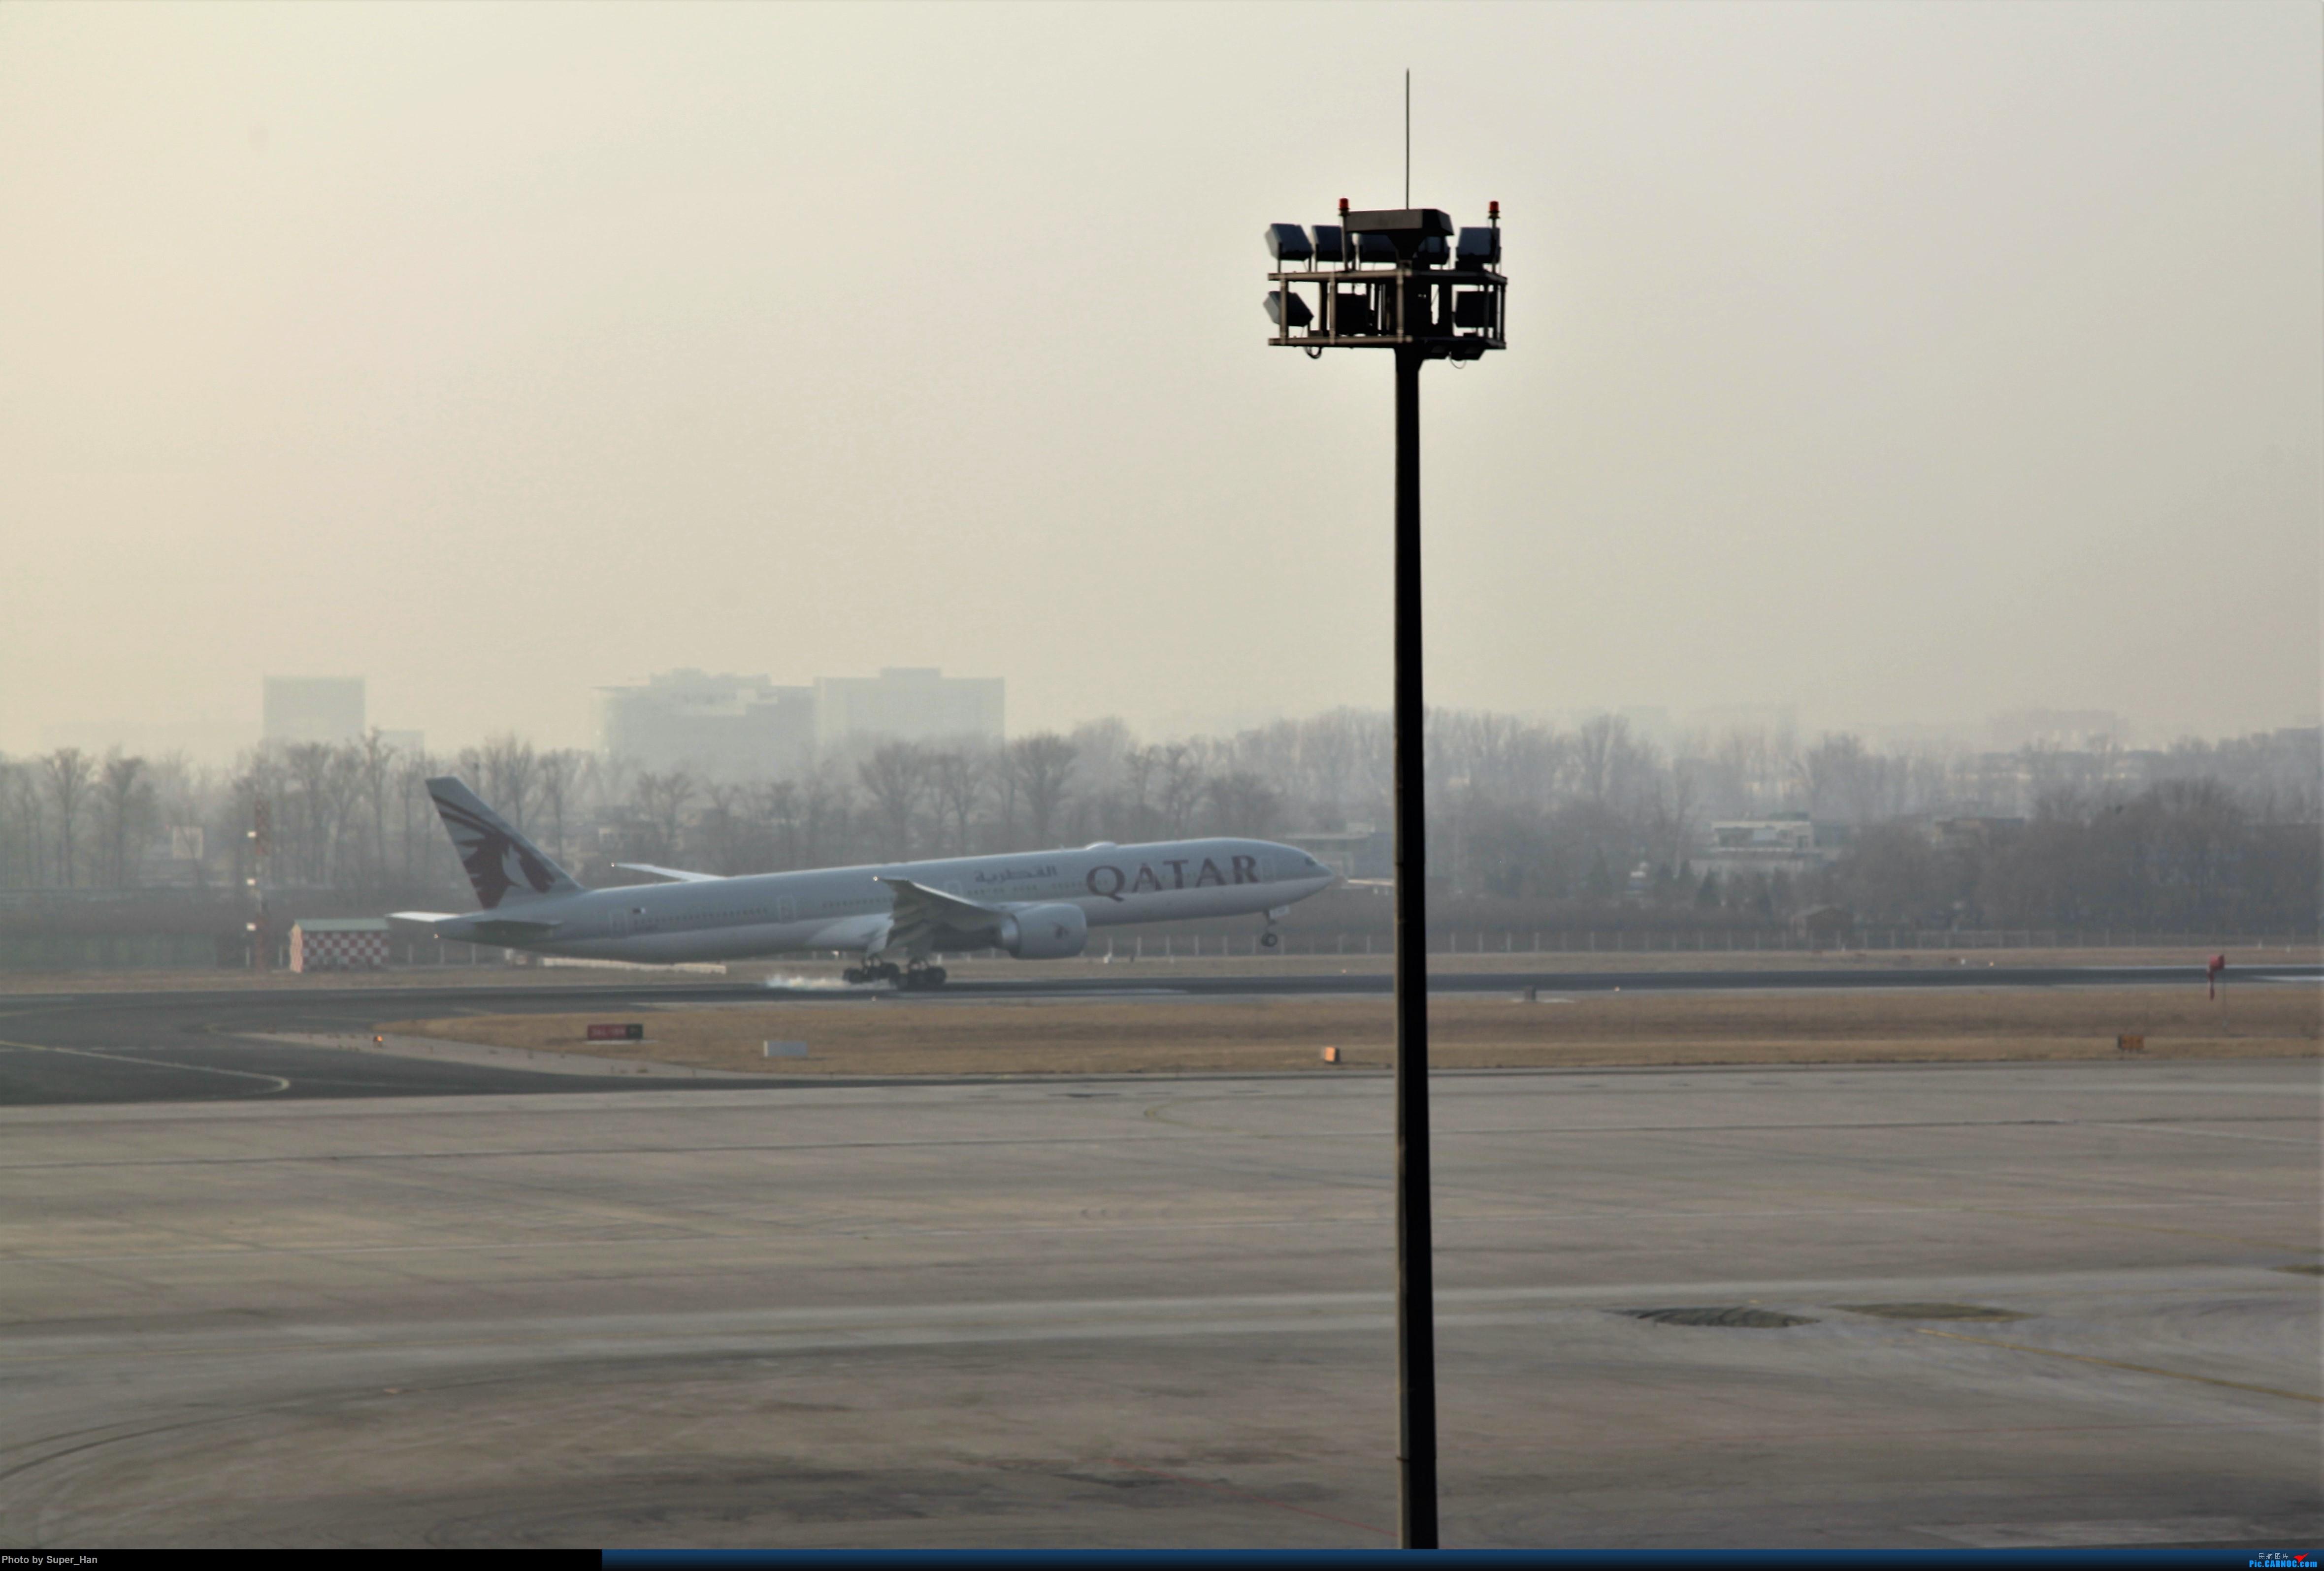 Re:[原创]2019虹桥出发飞北京第一拍 BOEING 777-300ER  中国北京首都国际机场